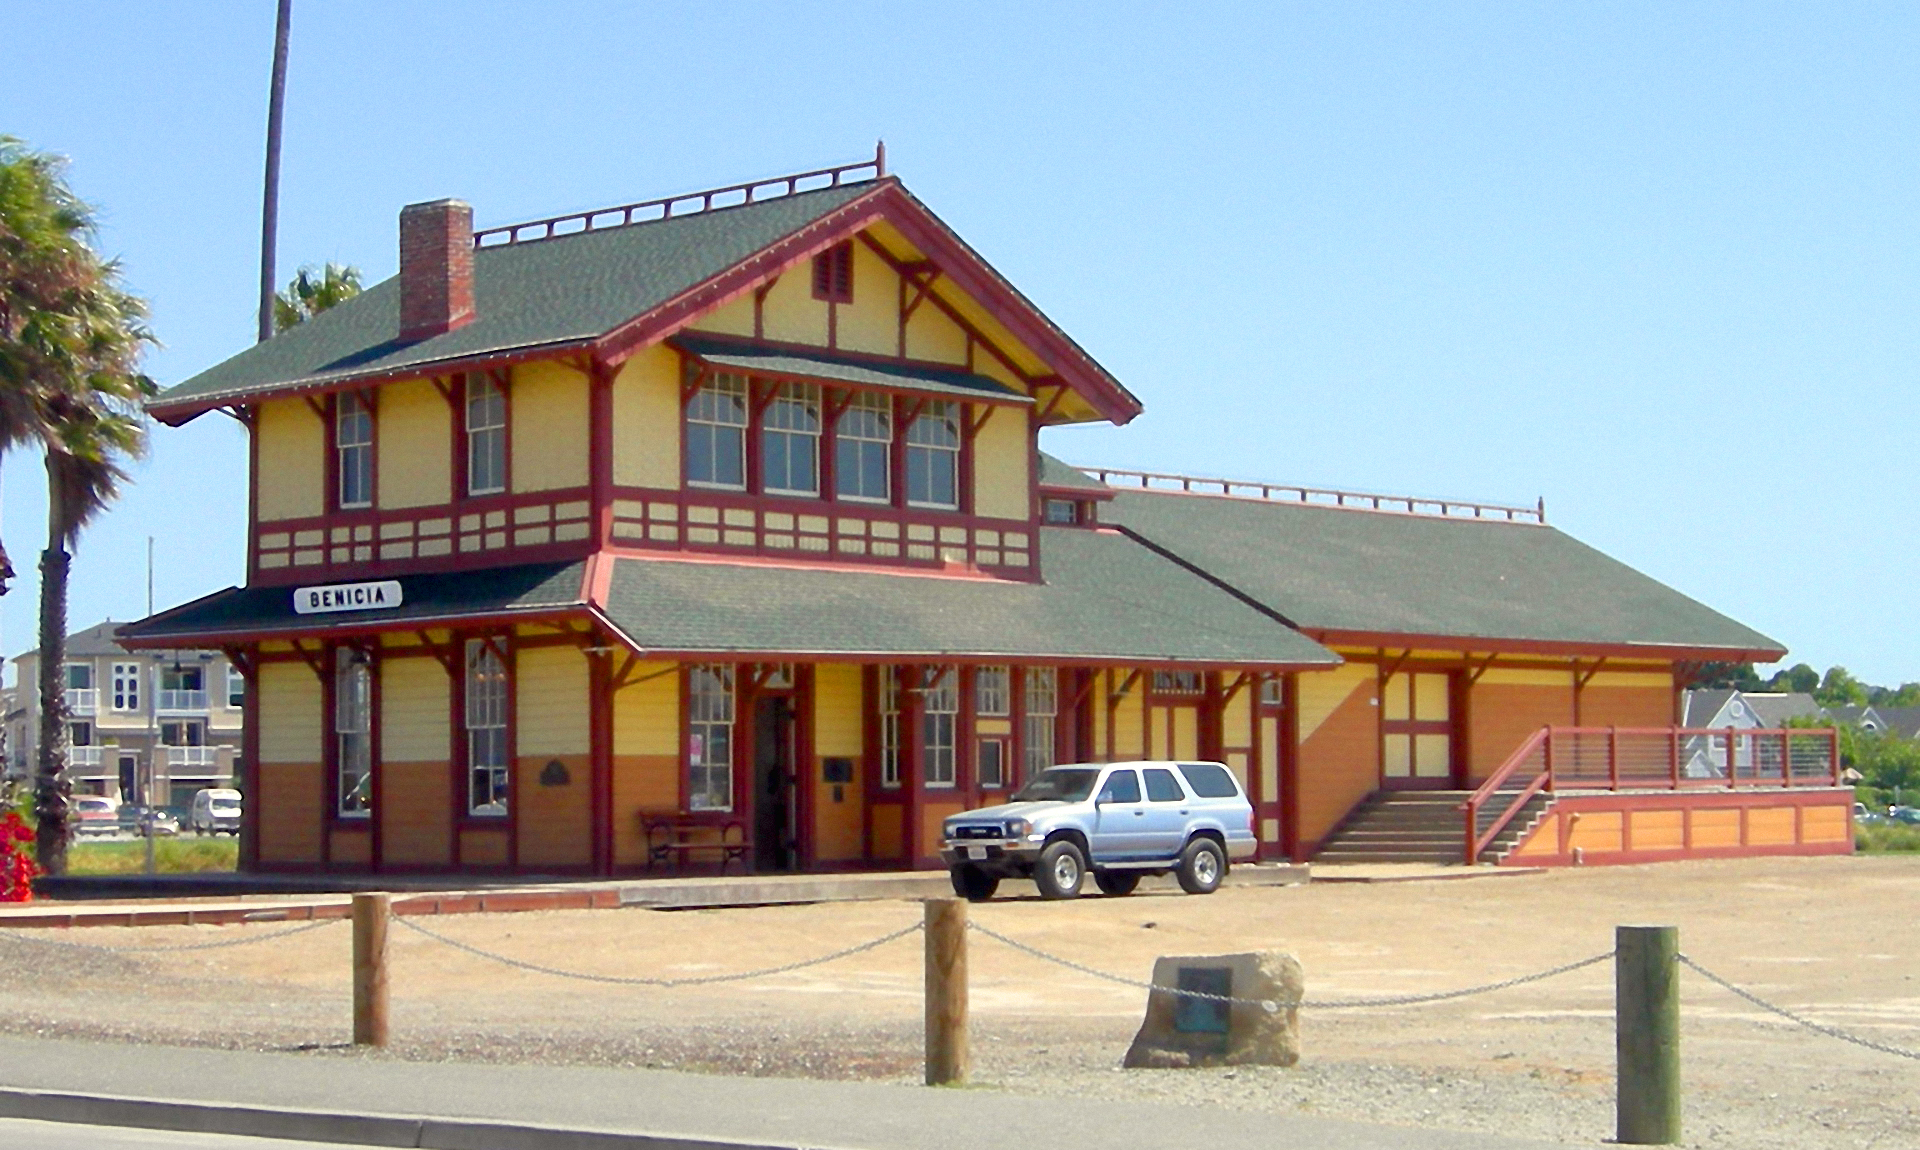 Station Pier Car Park